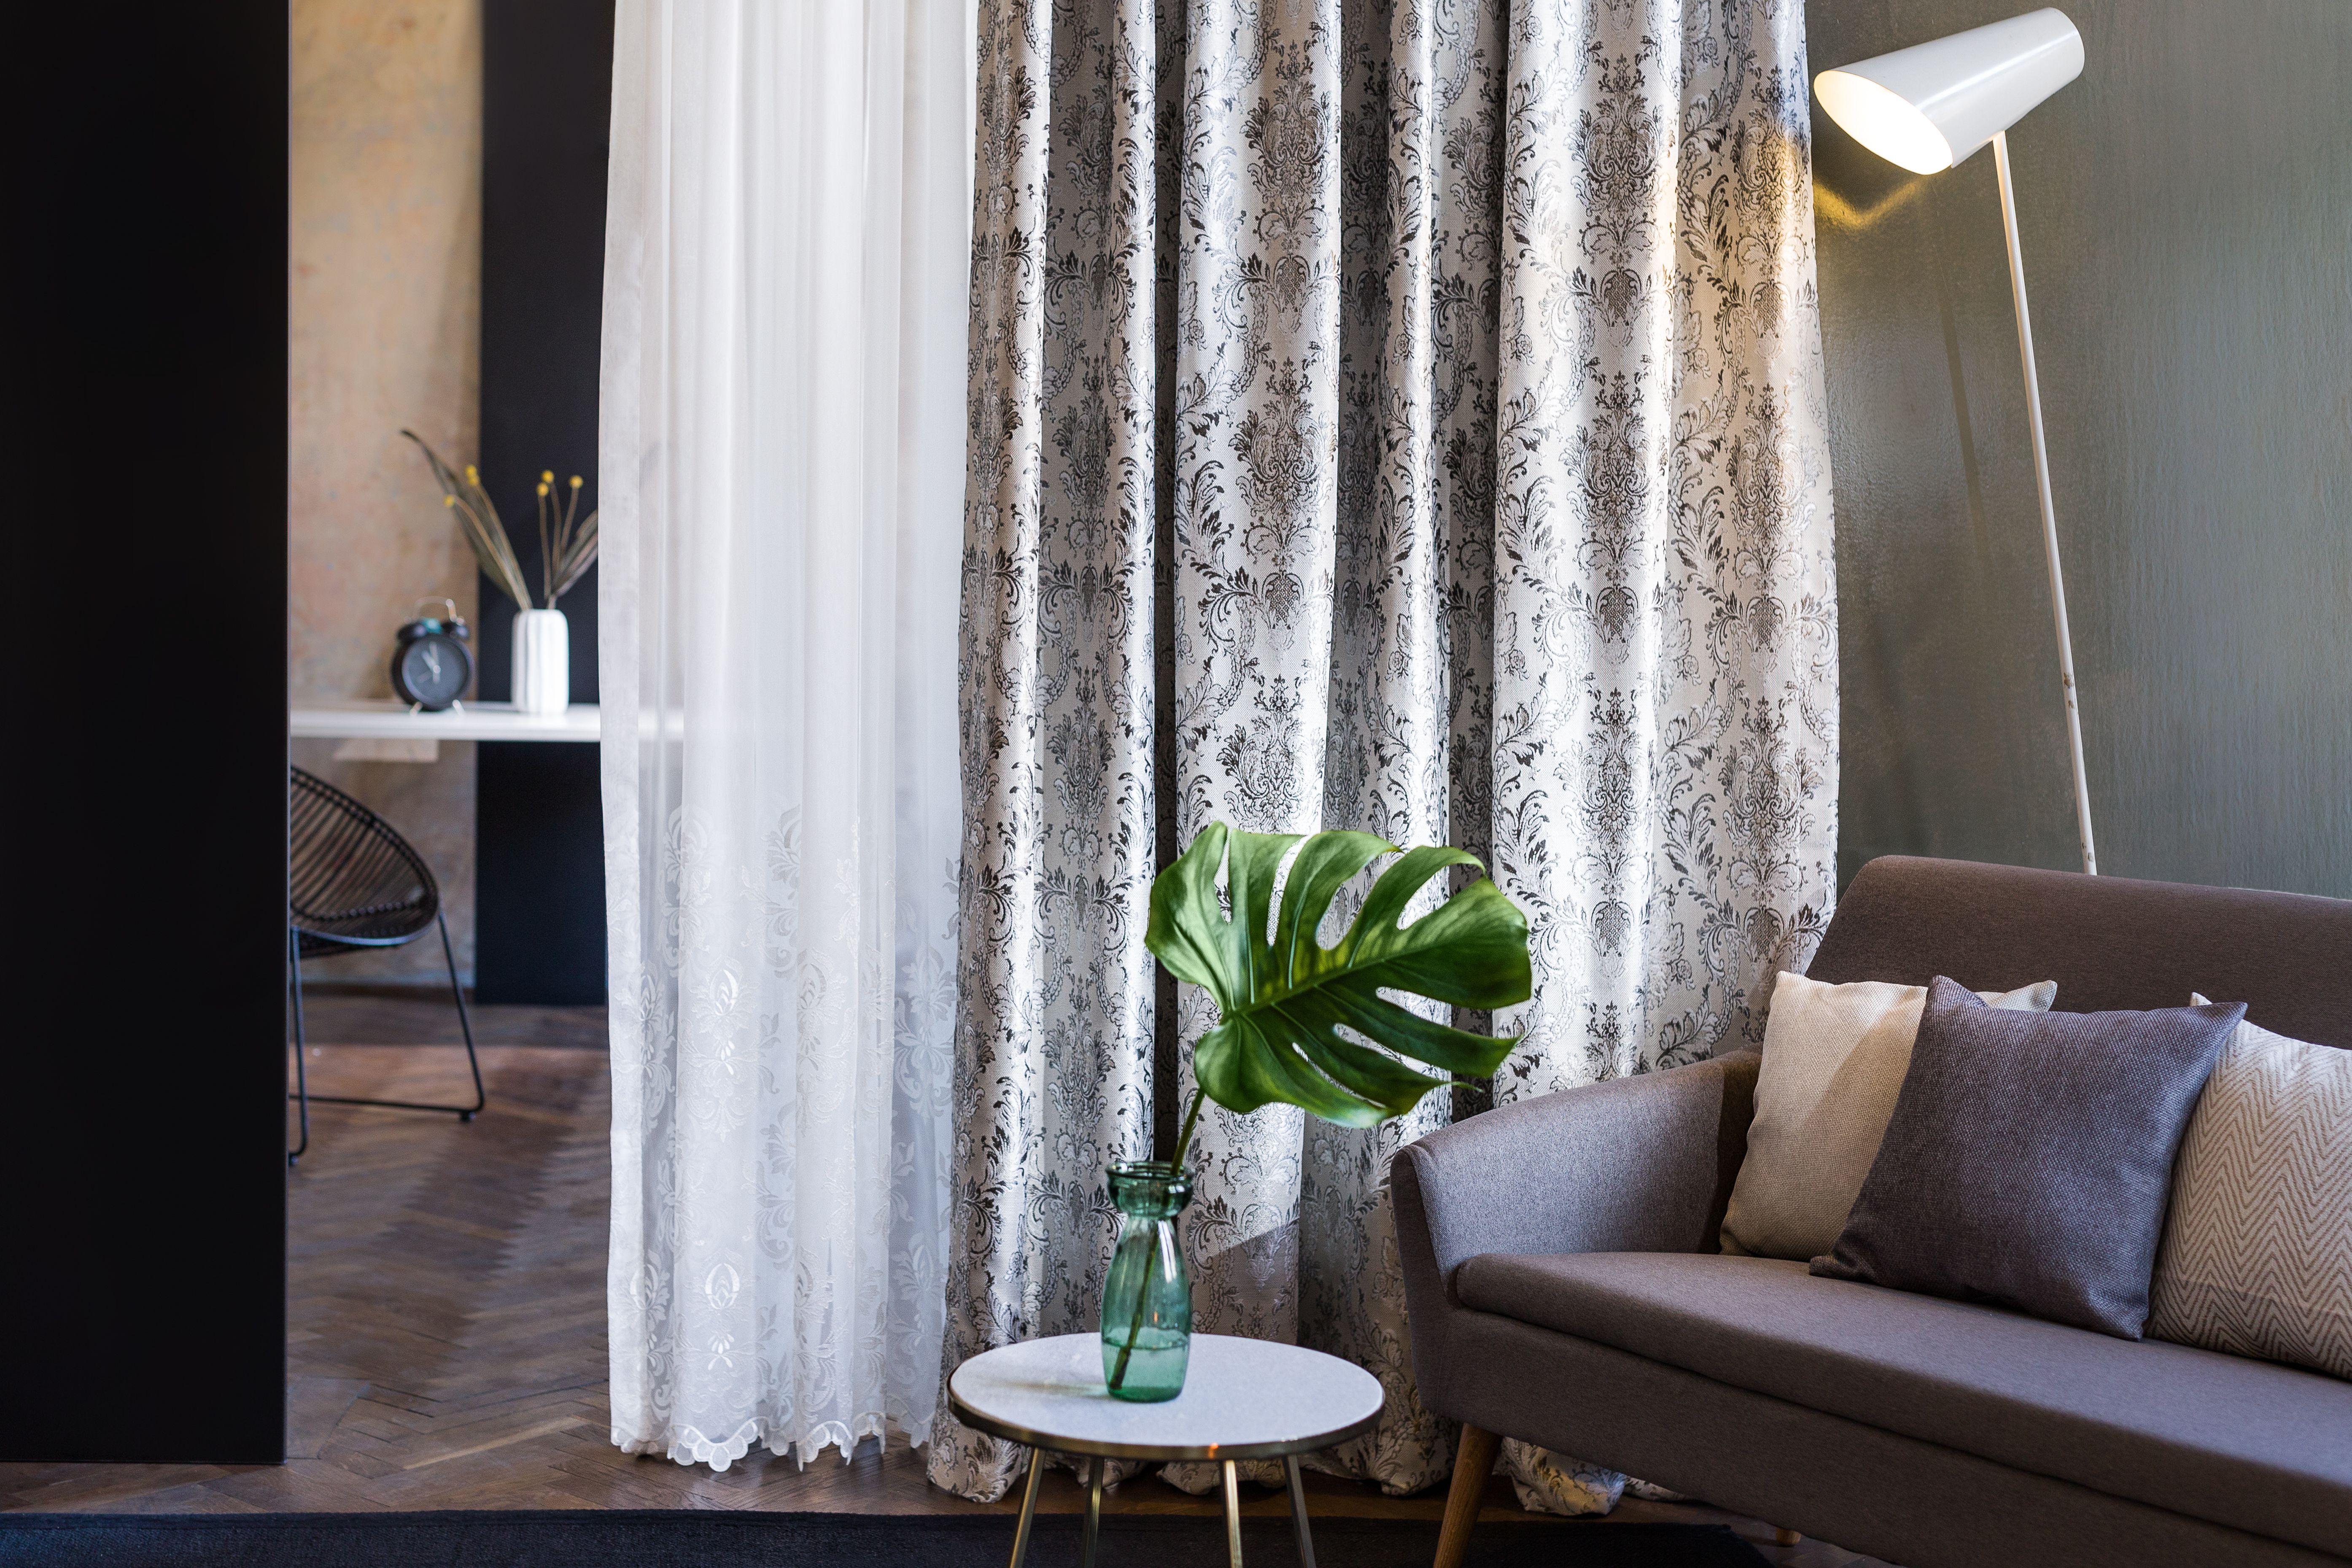 #mendolafabrics #findyourinspiration #homedesign #interiordesign #livingroom #decor #designideas #curtains #classydecor #cozyplace #cozyhomw #relaxingplace #homeinspiration